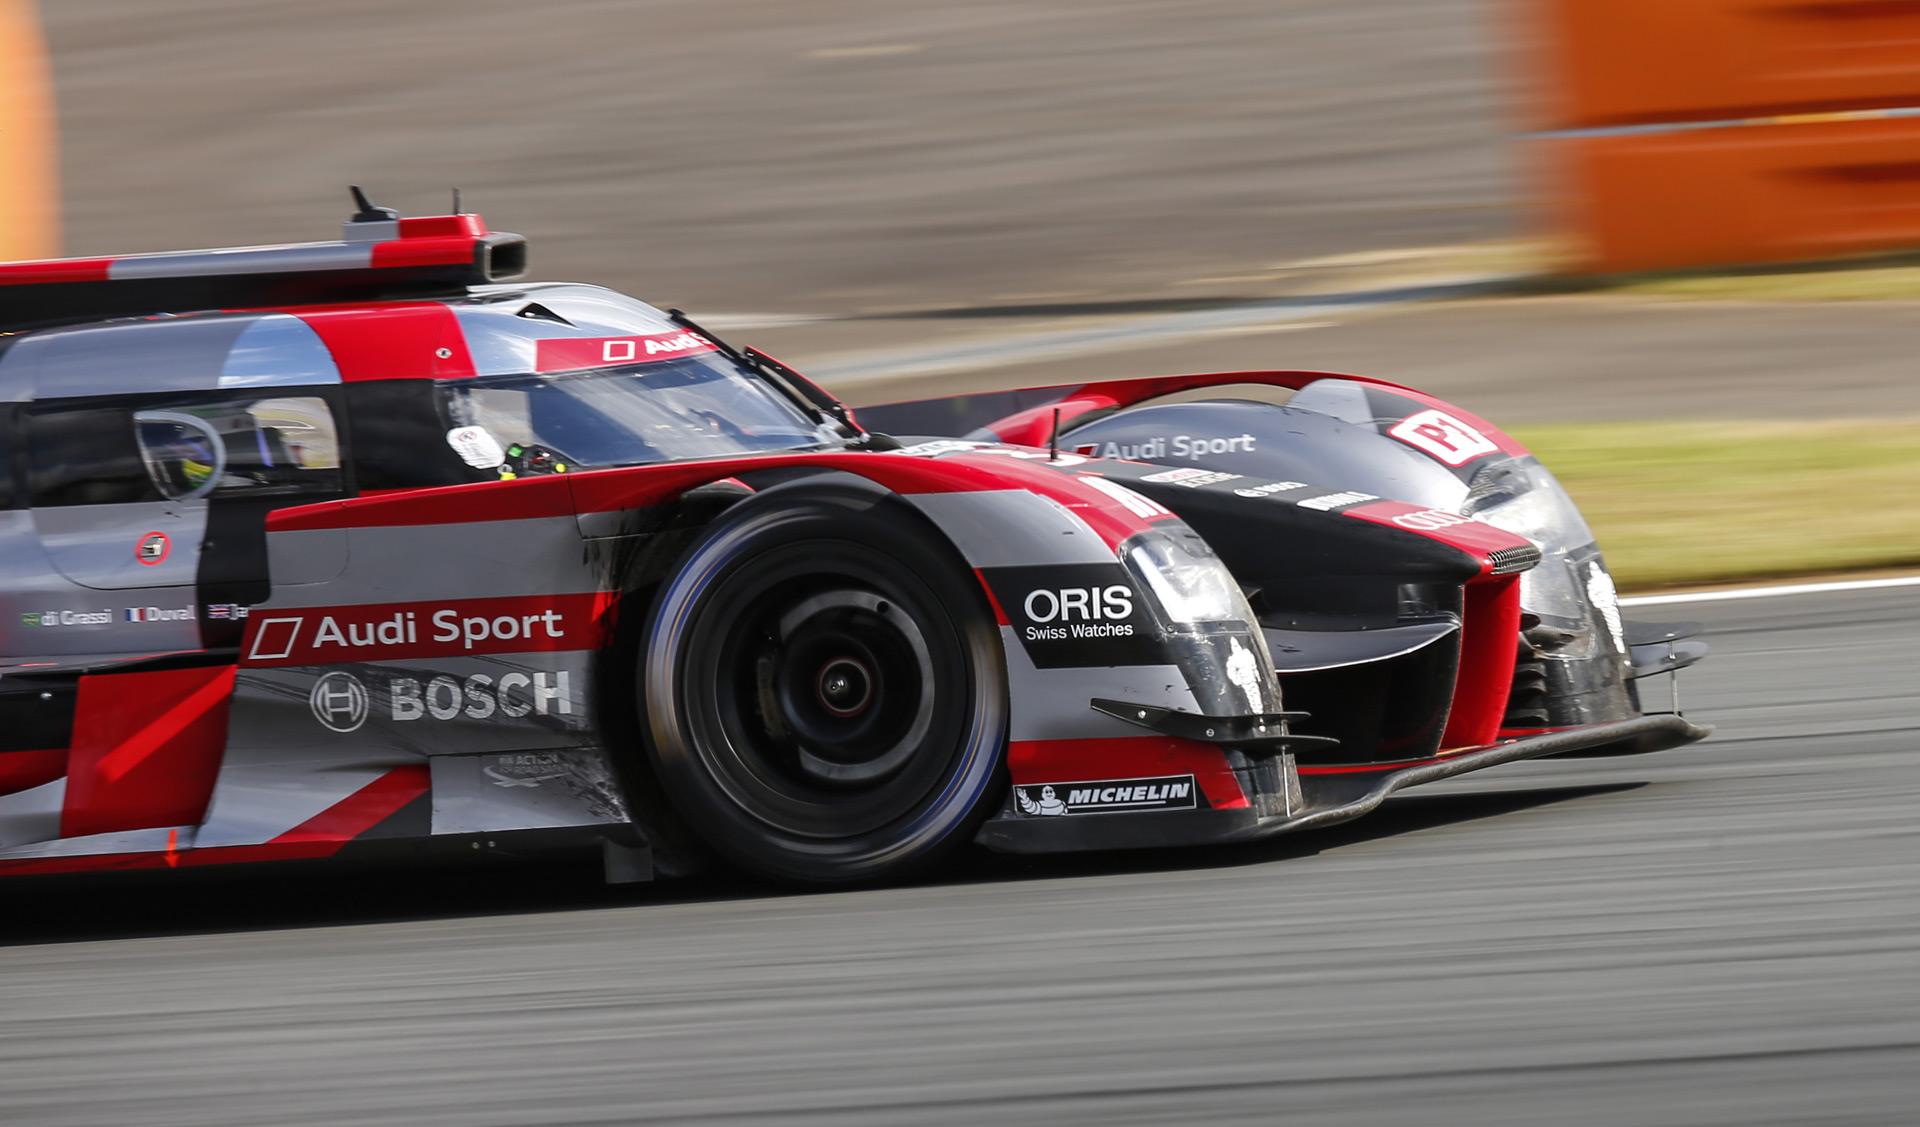 Race Car News Today